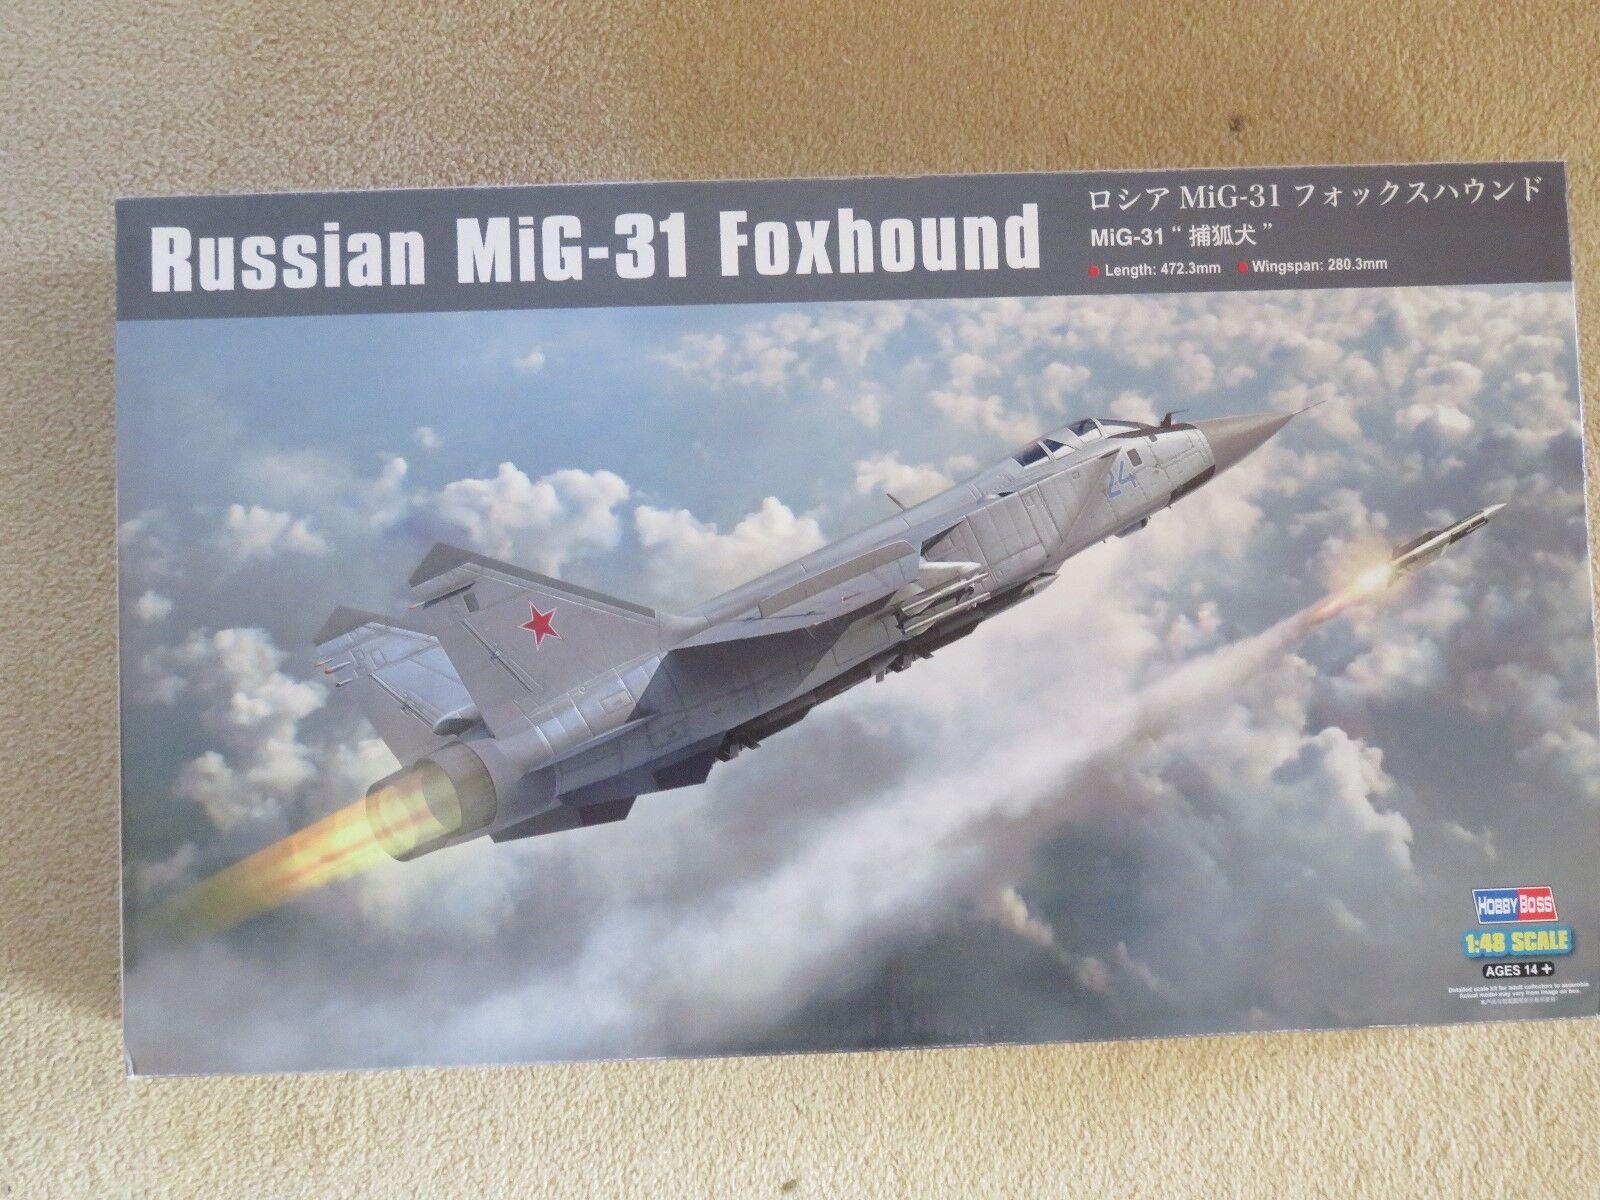 HobbyBoss 1 48 scale Russian Mig-31 Foxhound